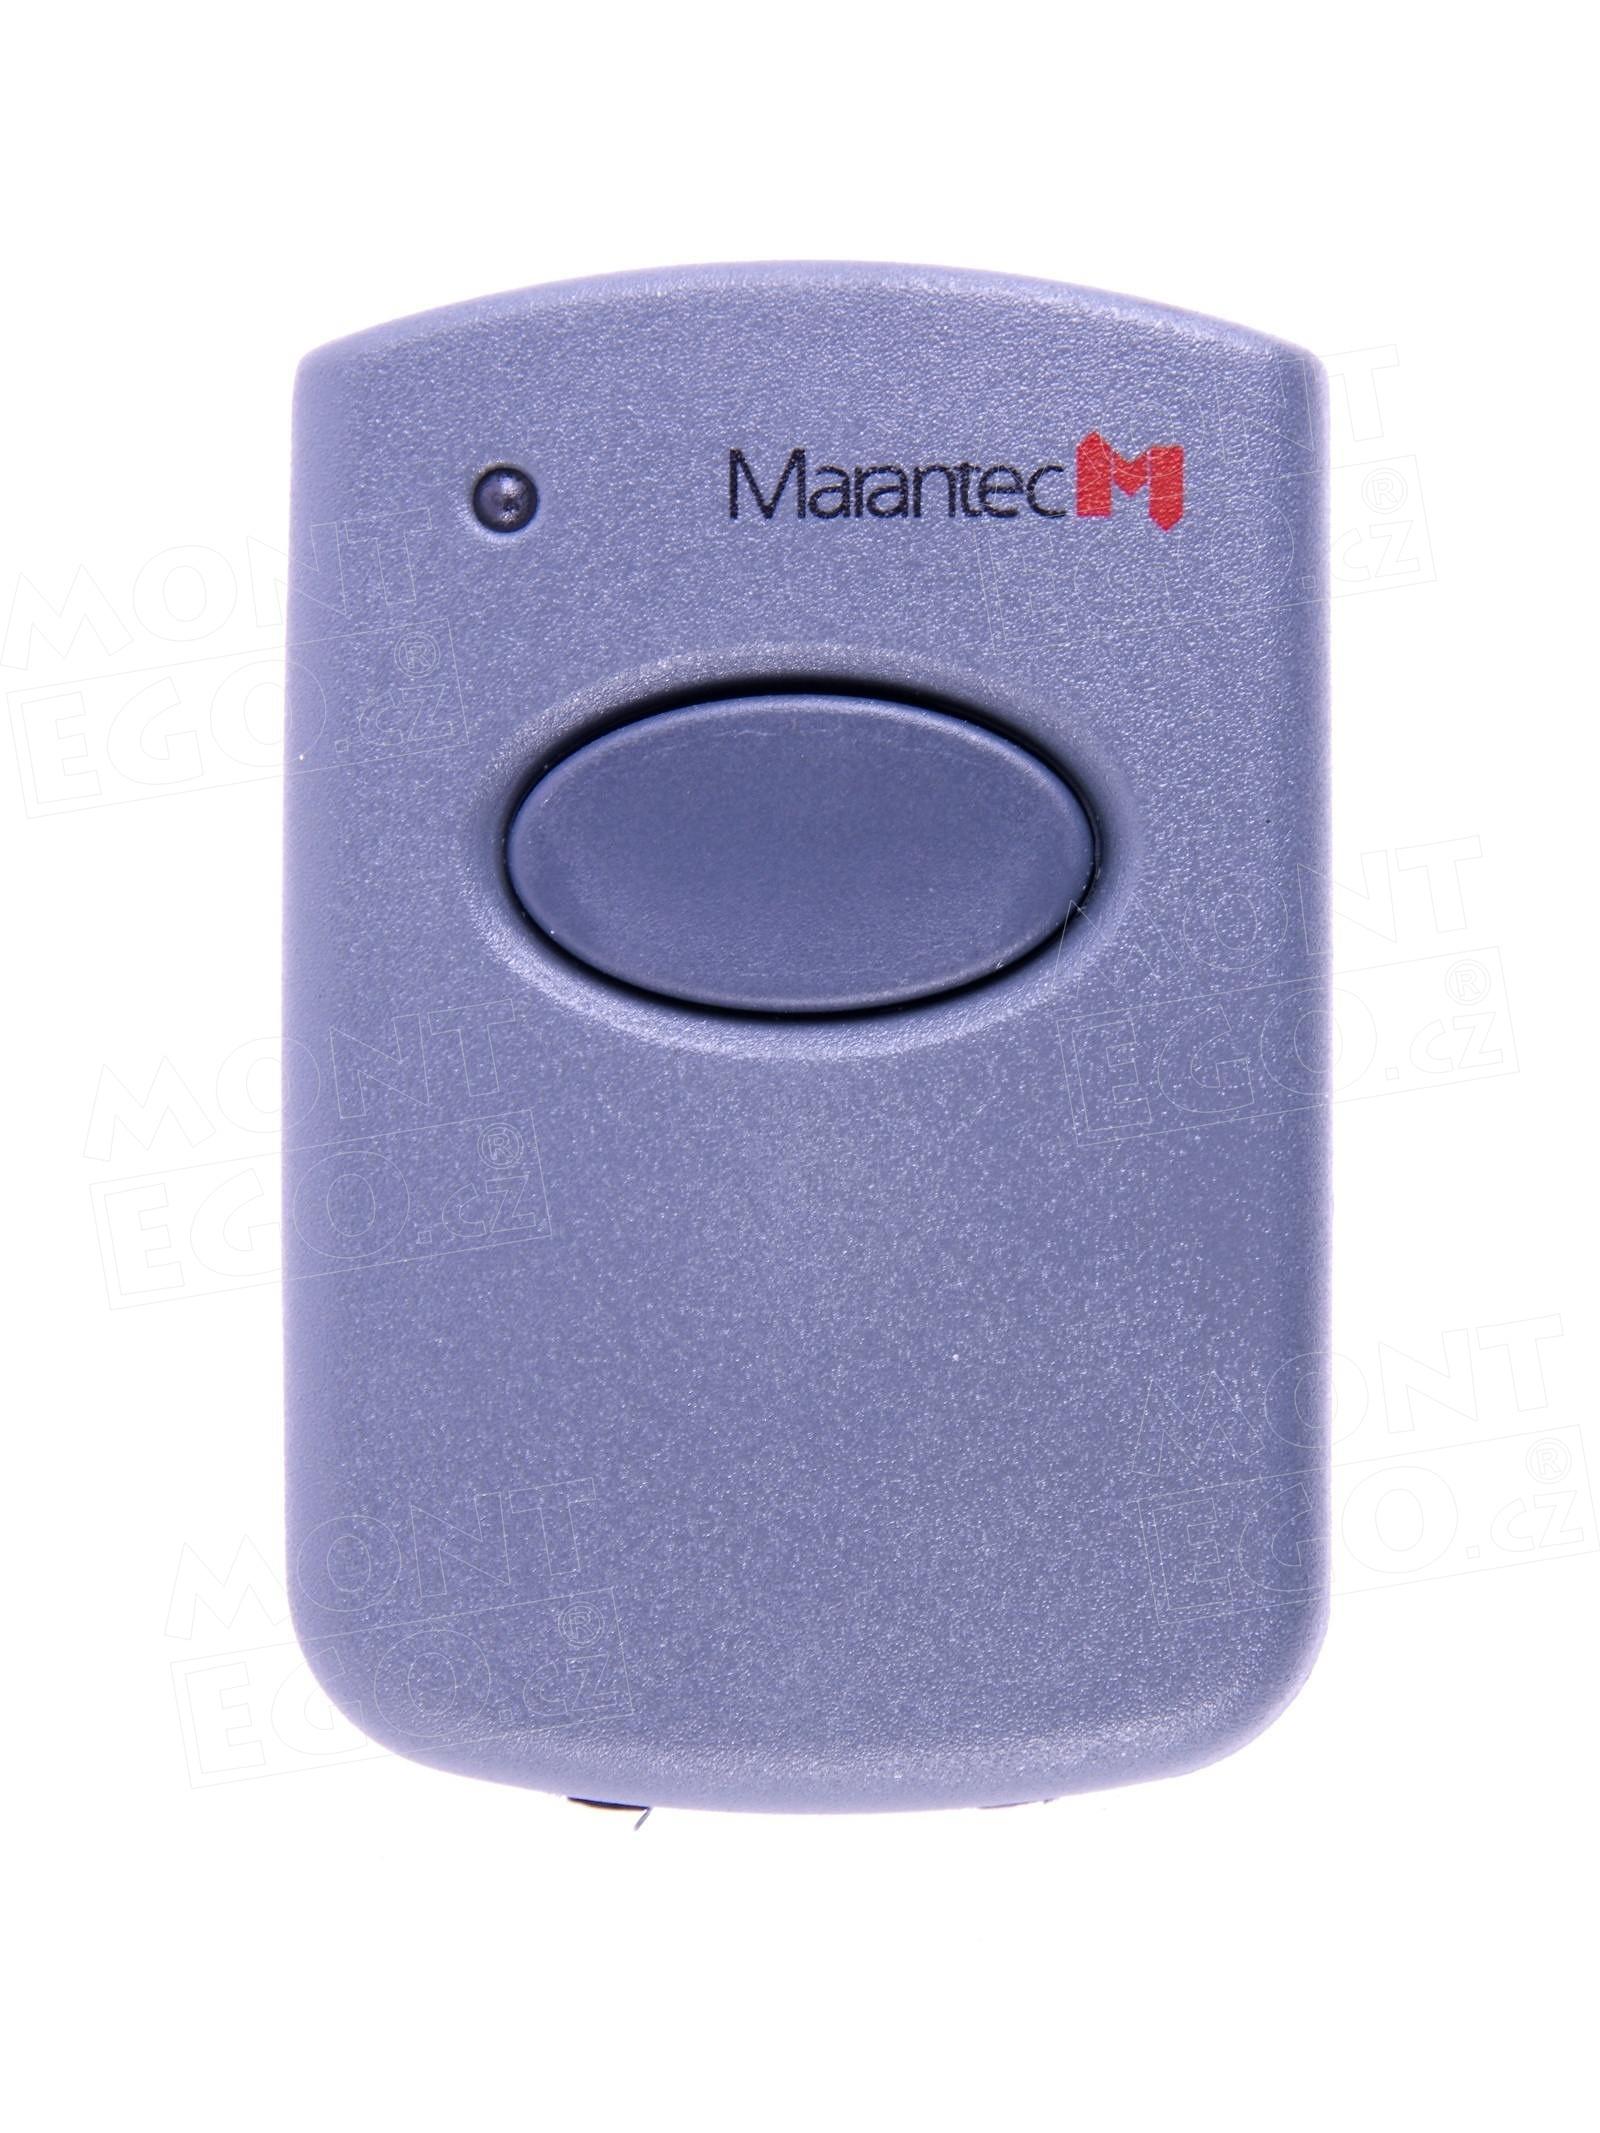 Mini dálkový ovládač pohonů bran a vrat Marantec Digital 321, 1 kanálový dálkový ovladač, 868,3 MHz